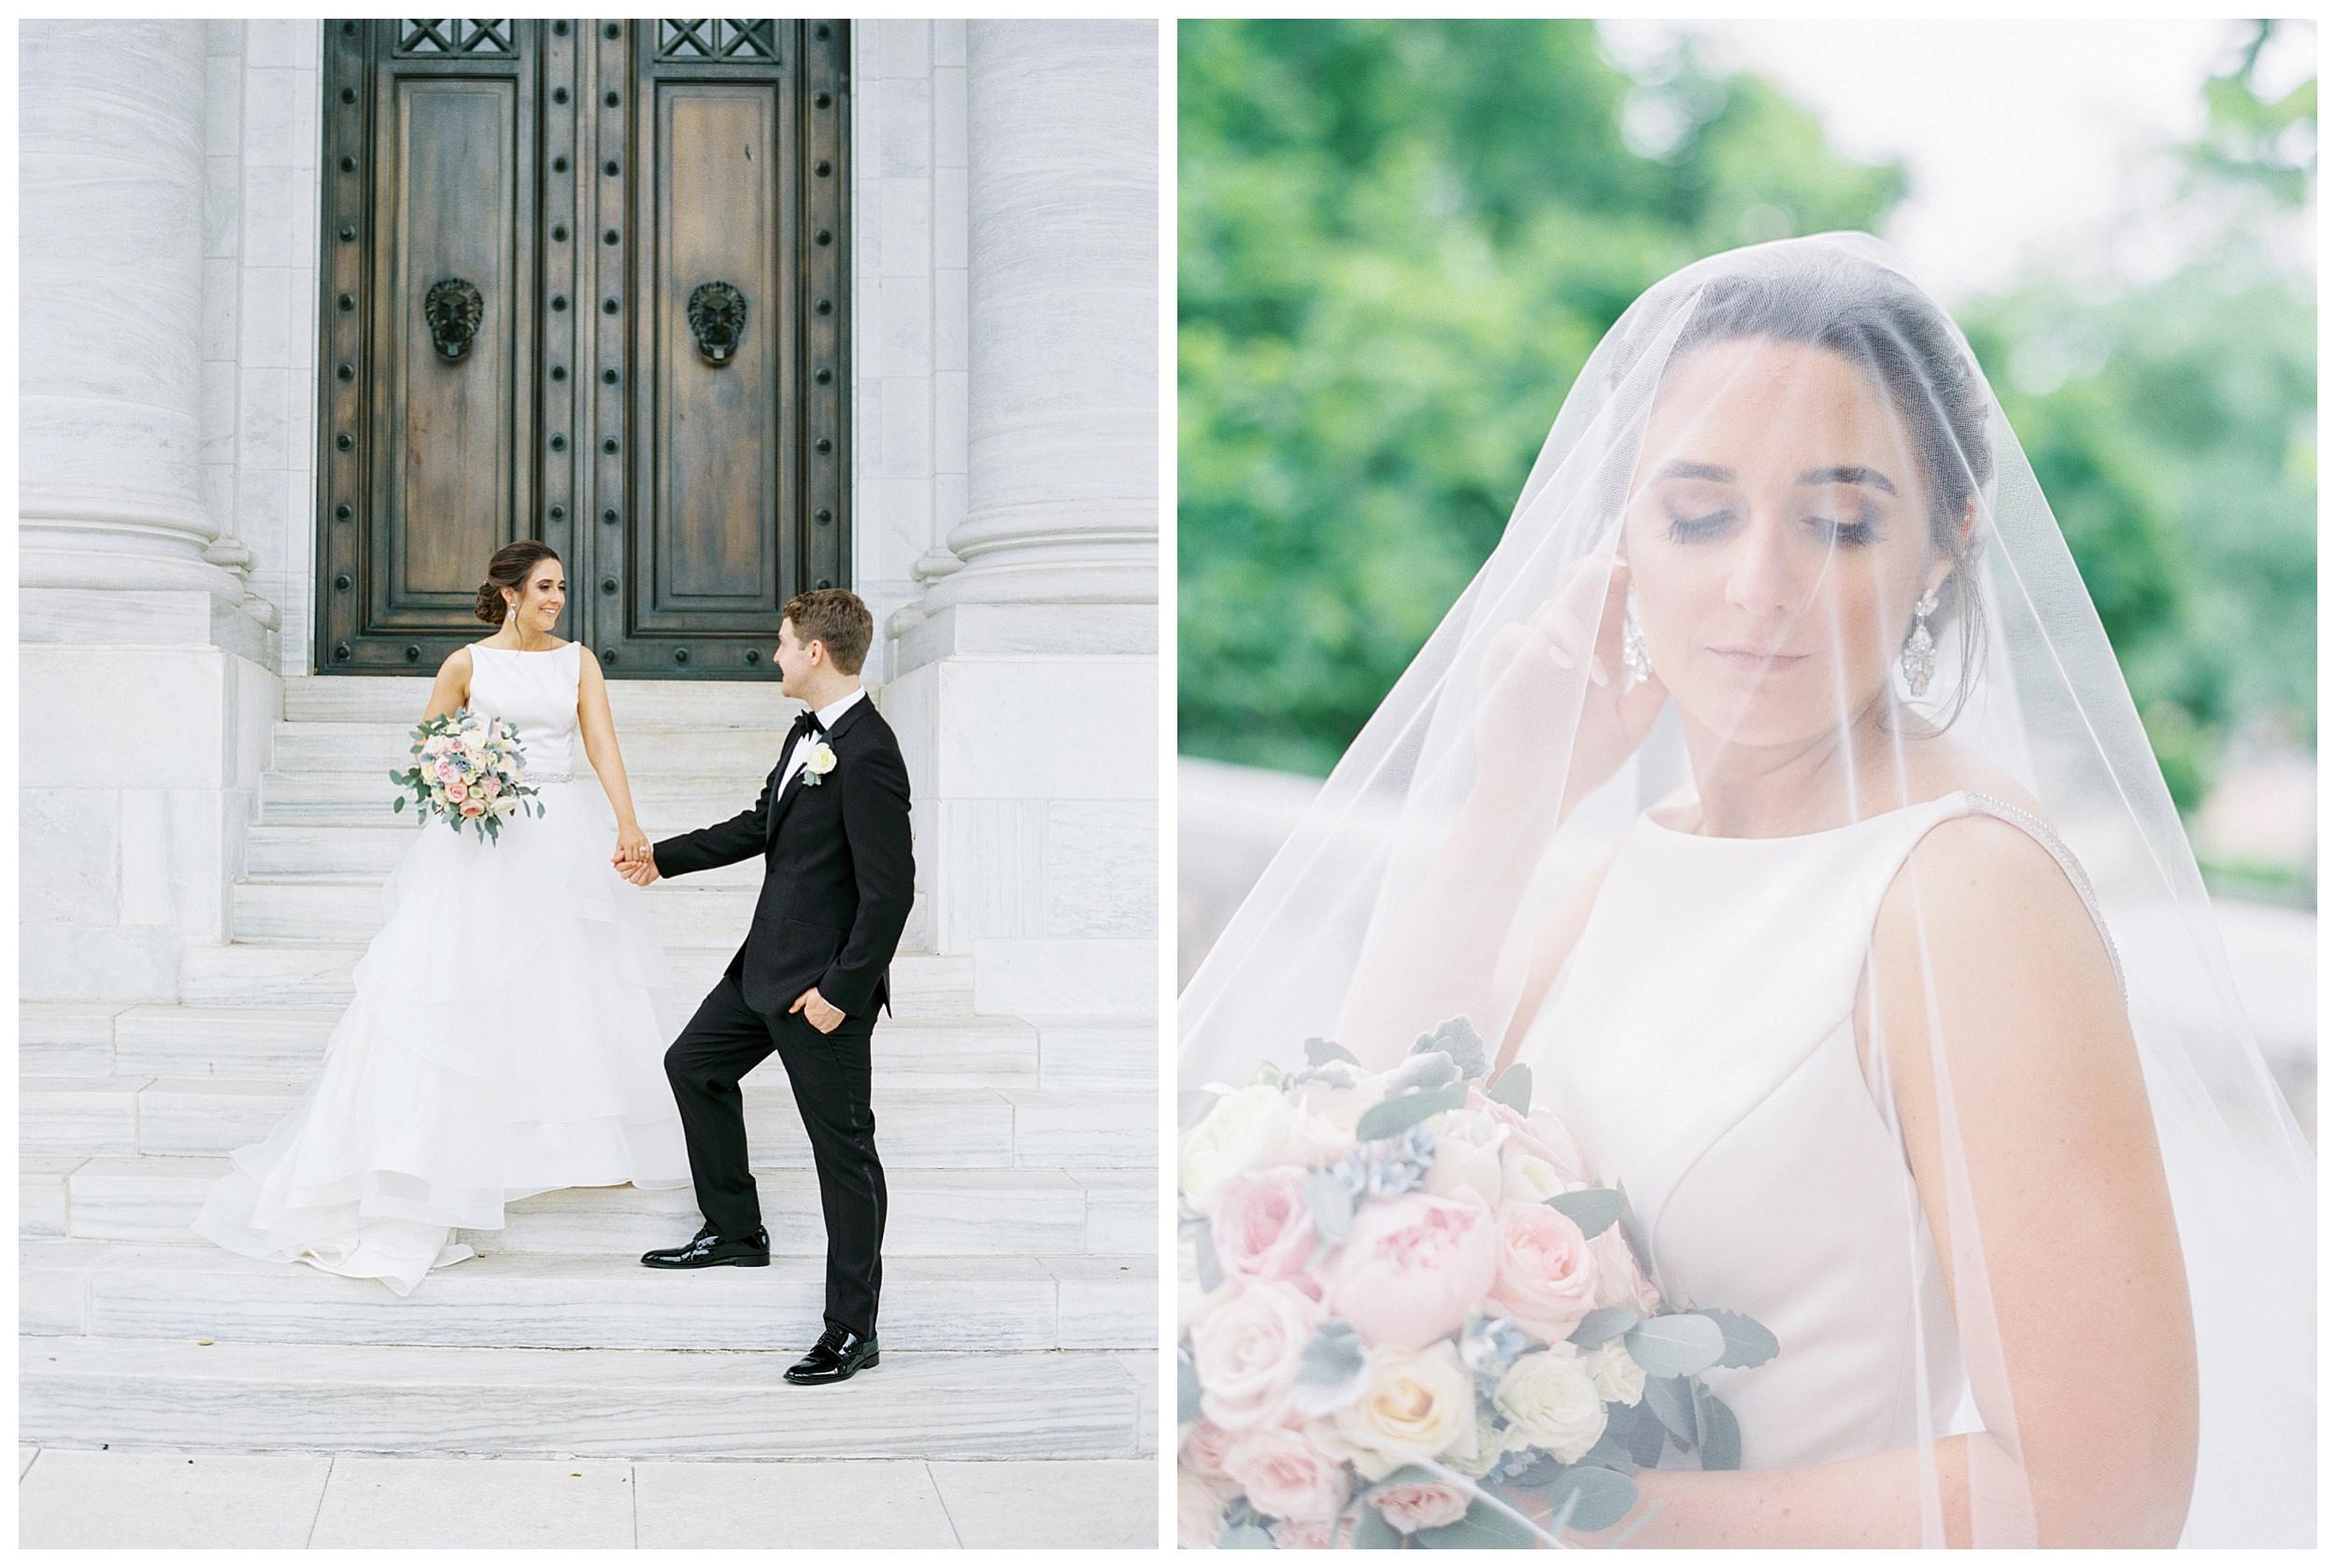 DAR Constitution Hall Wedding Wedding | Daughters of the American Revolution Wedding | District of Columbia Film Wedding Photographer Kir Tuben_0114.jpg